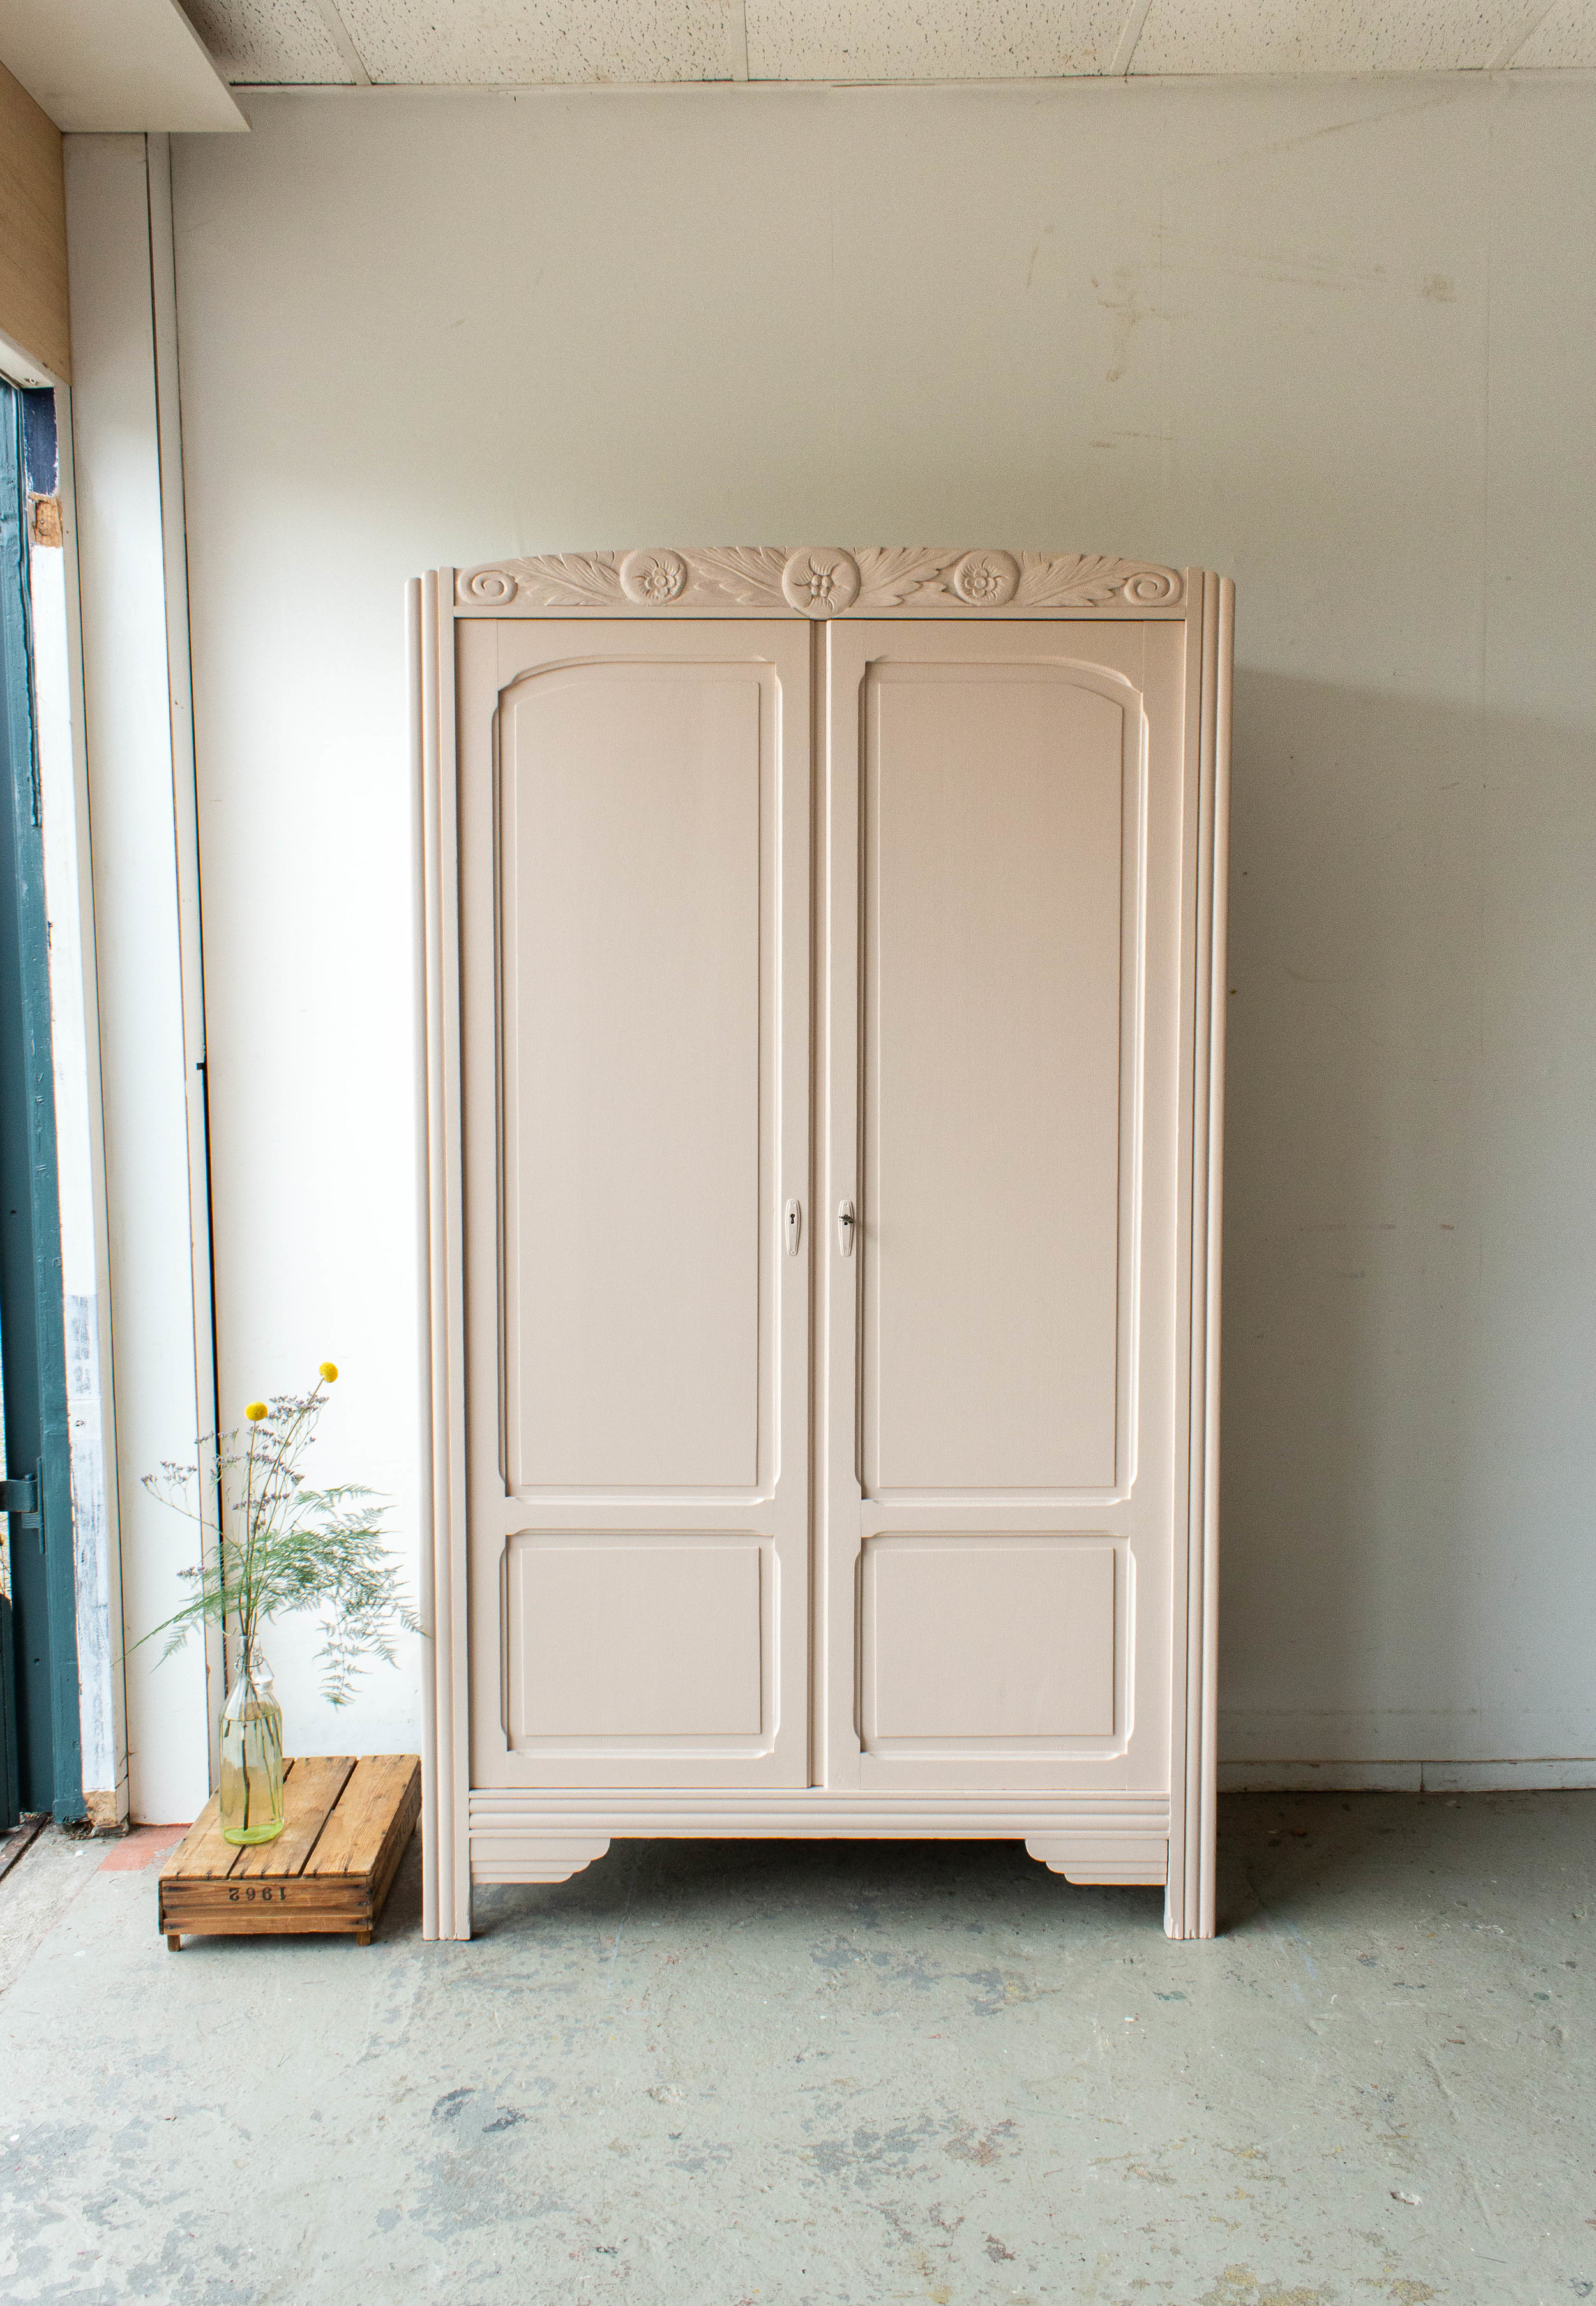 1552 - Bloesemroze vintage kledingkast-6.jpg